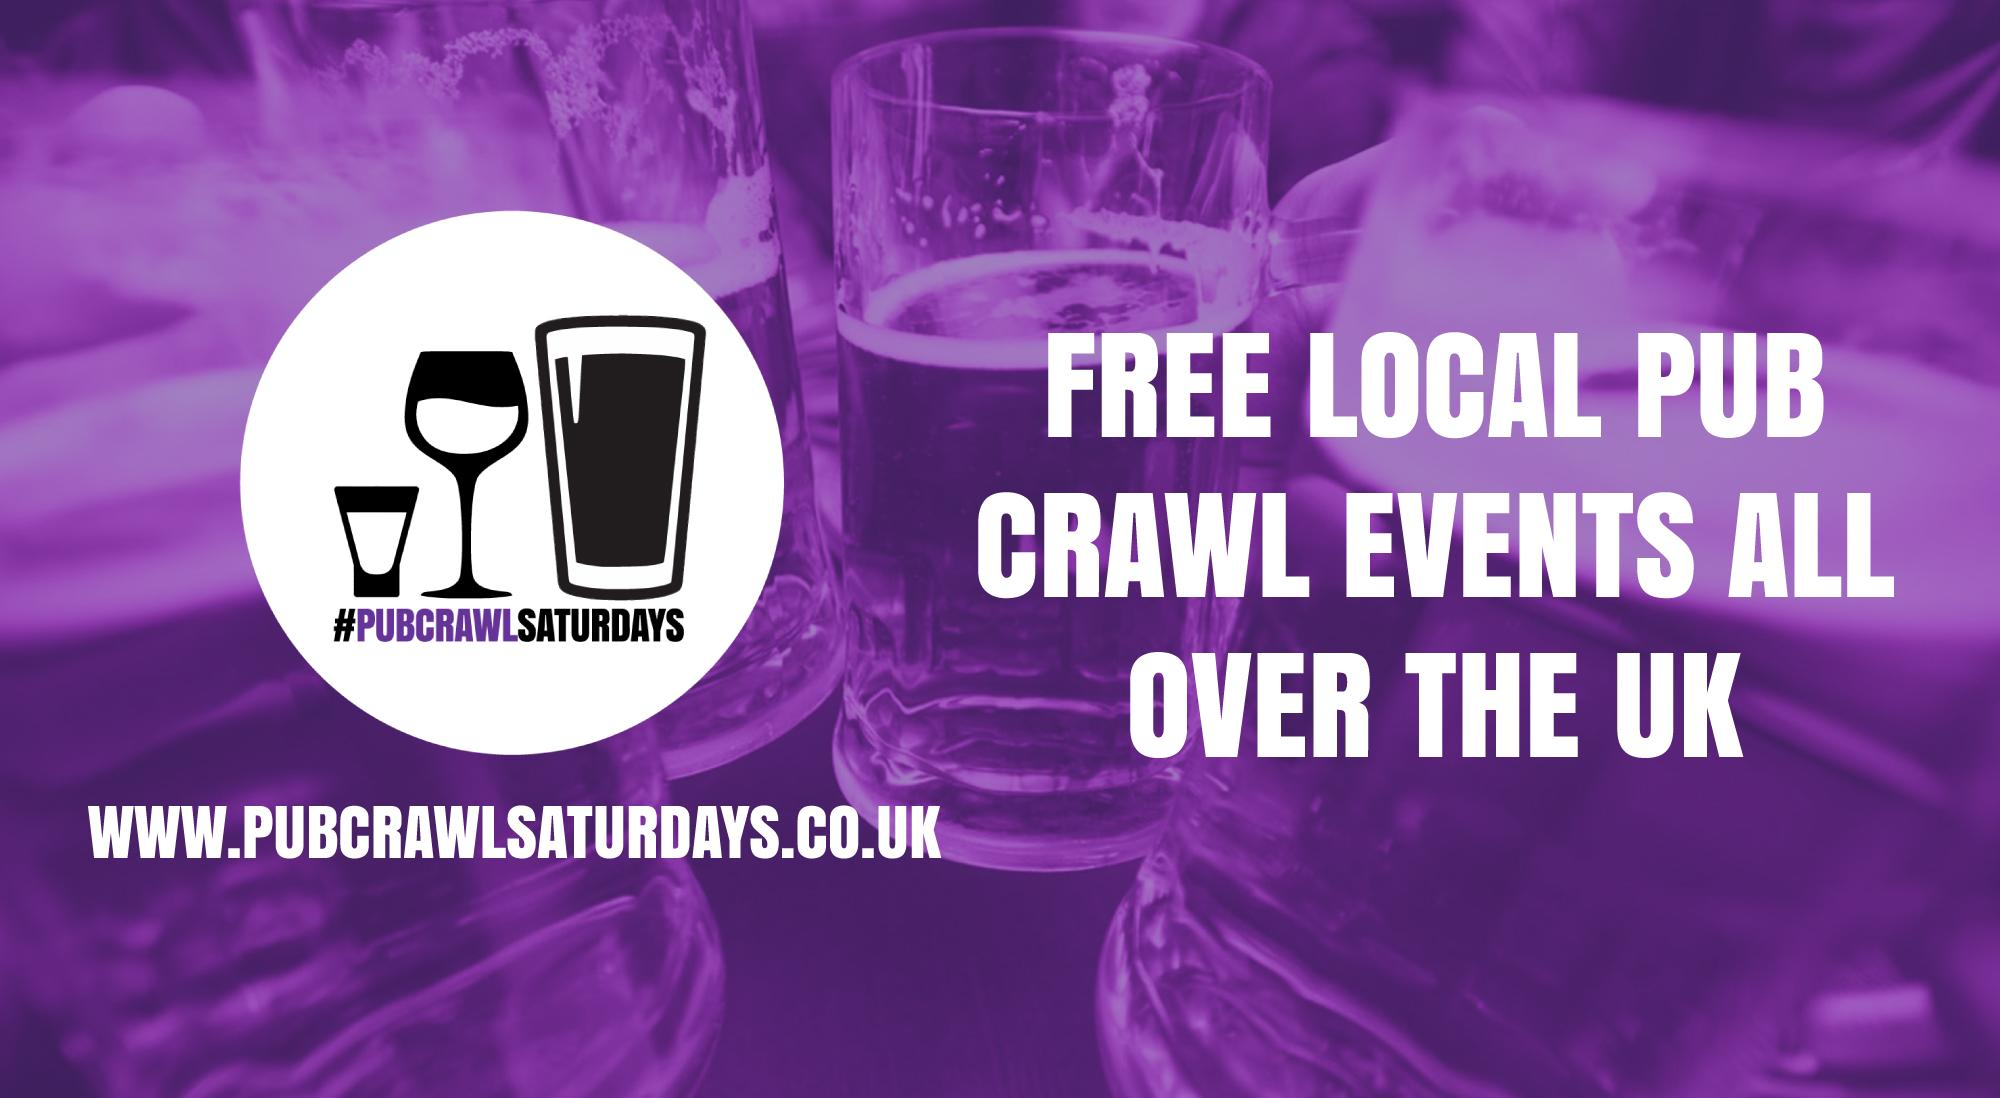 PUB CRAWL SATURDAYS! Free weekly pub crawl event in Hucknall